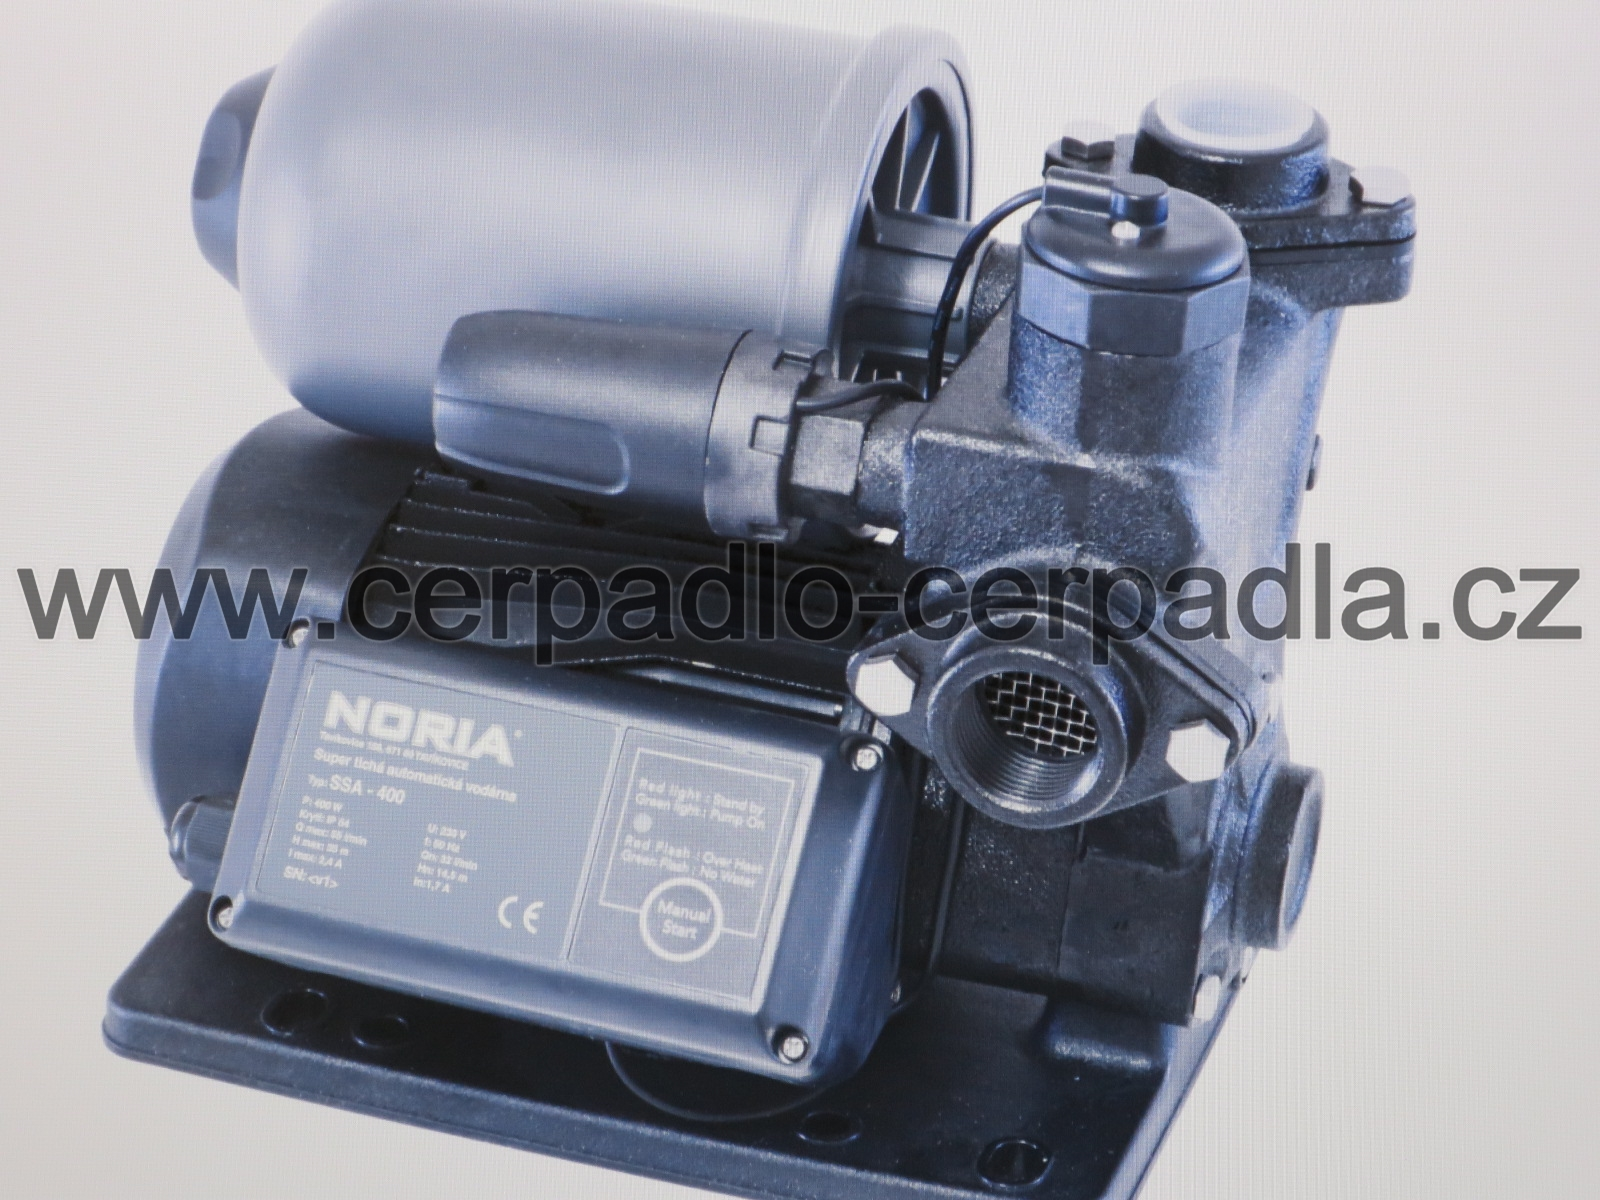 NORIA SSA-600, automatická vodárna, 230V, čerpadlo 200160 (super tichá automatická vodárna, SSA-600, záruka 3 roky, DOPRAVA ZDARMA)